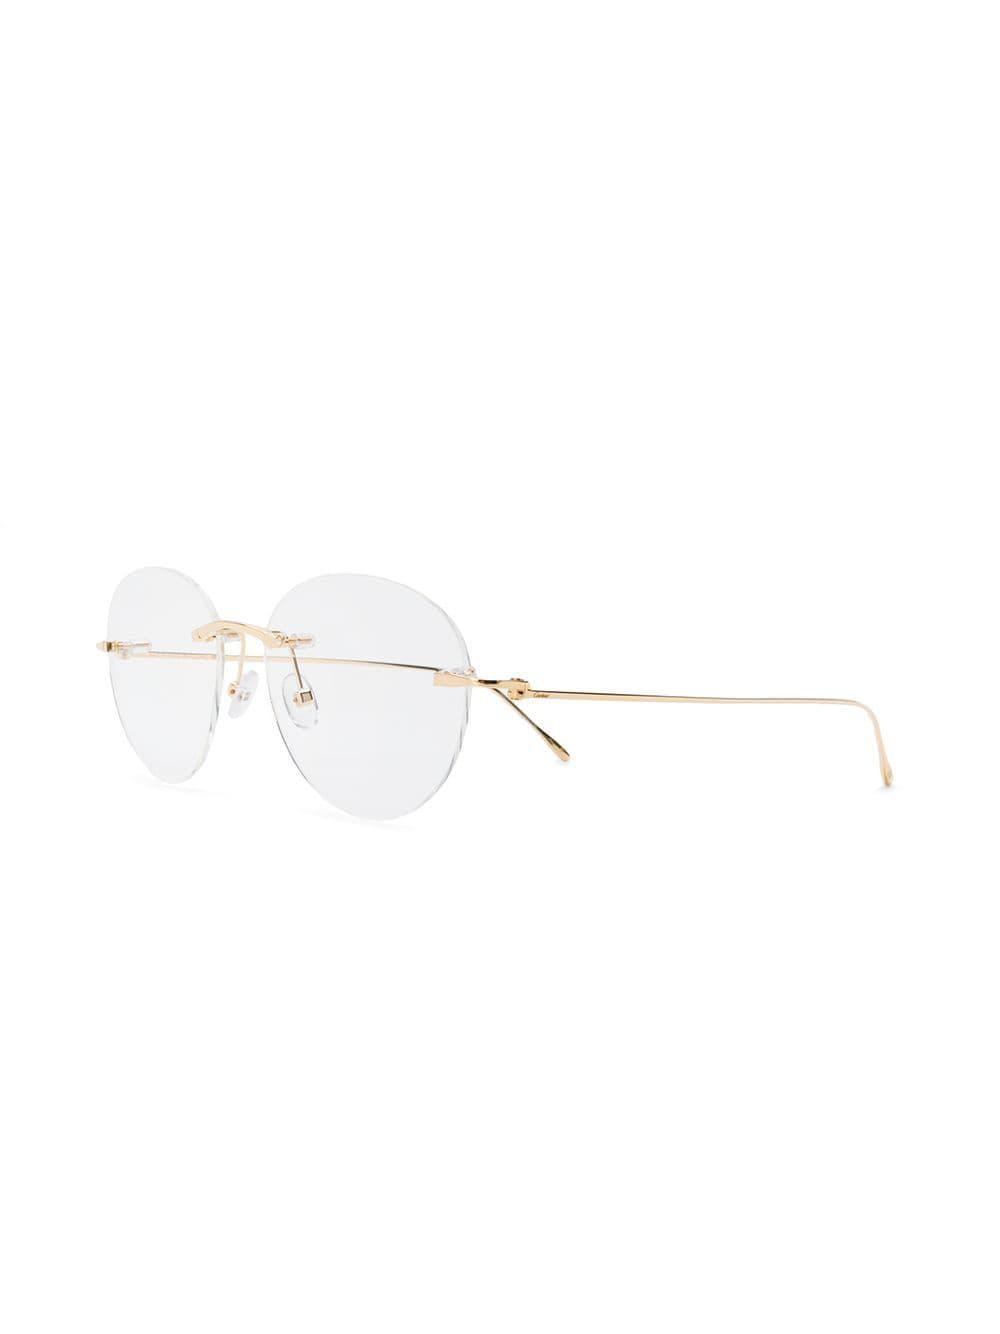 c9328c8f658 Cartier - Metallic Louis Glasses for Men - Lyst. View fullscreen